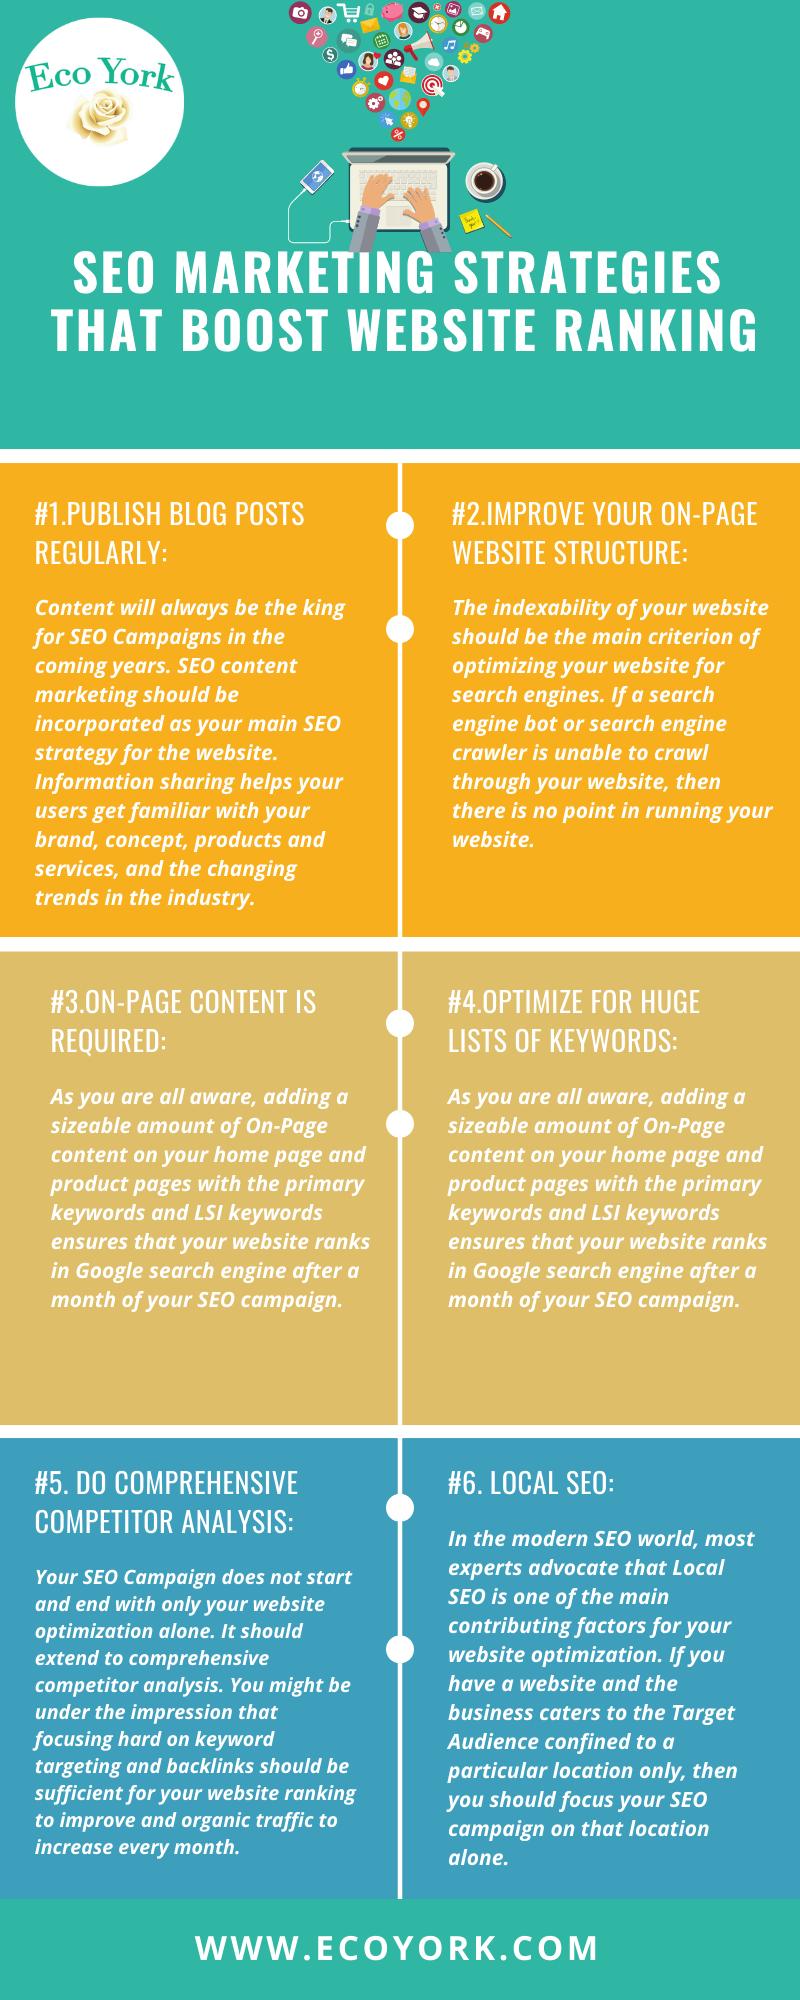 SEO Marketing Strategies That Boost Website Ranking